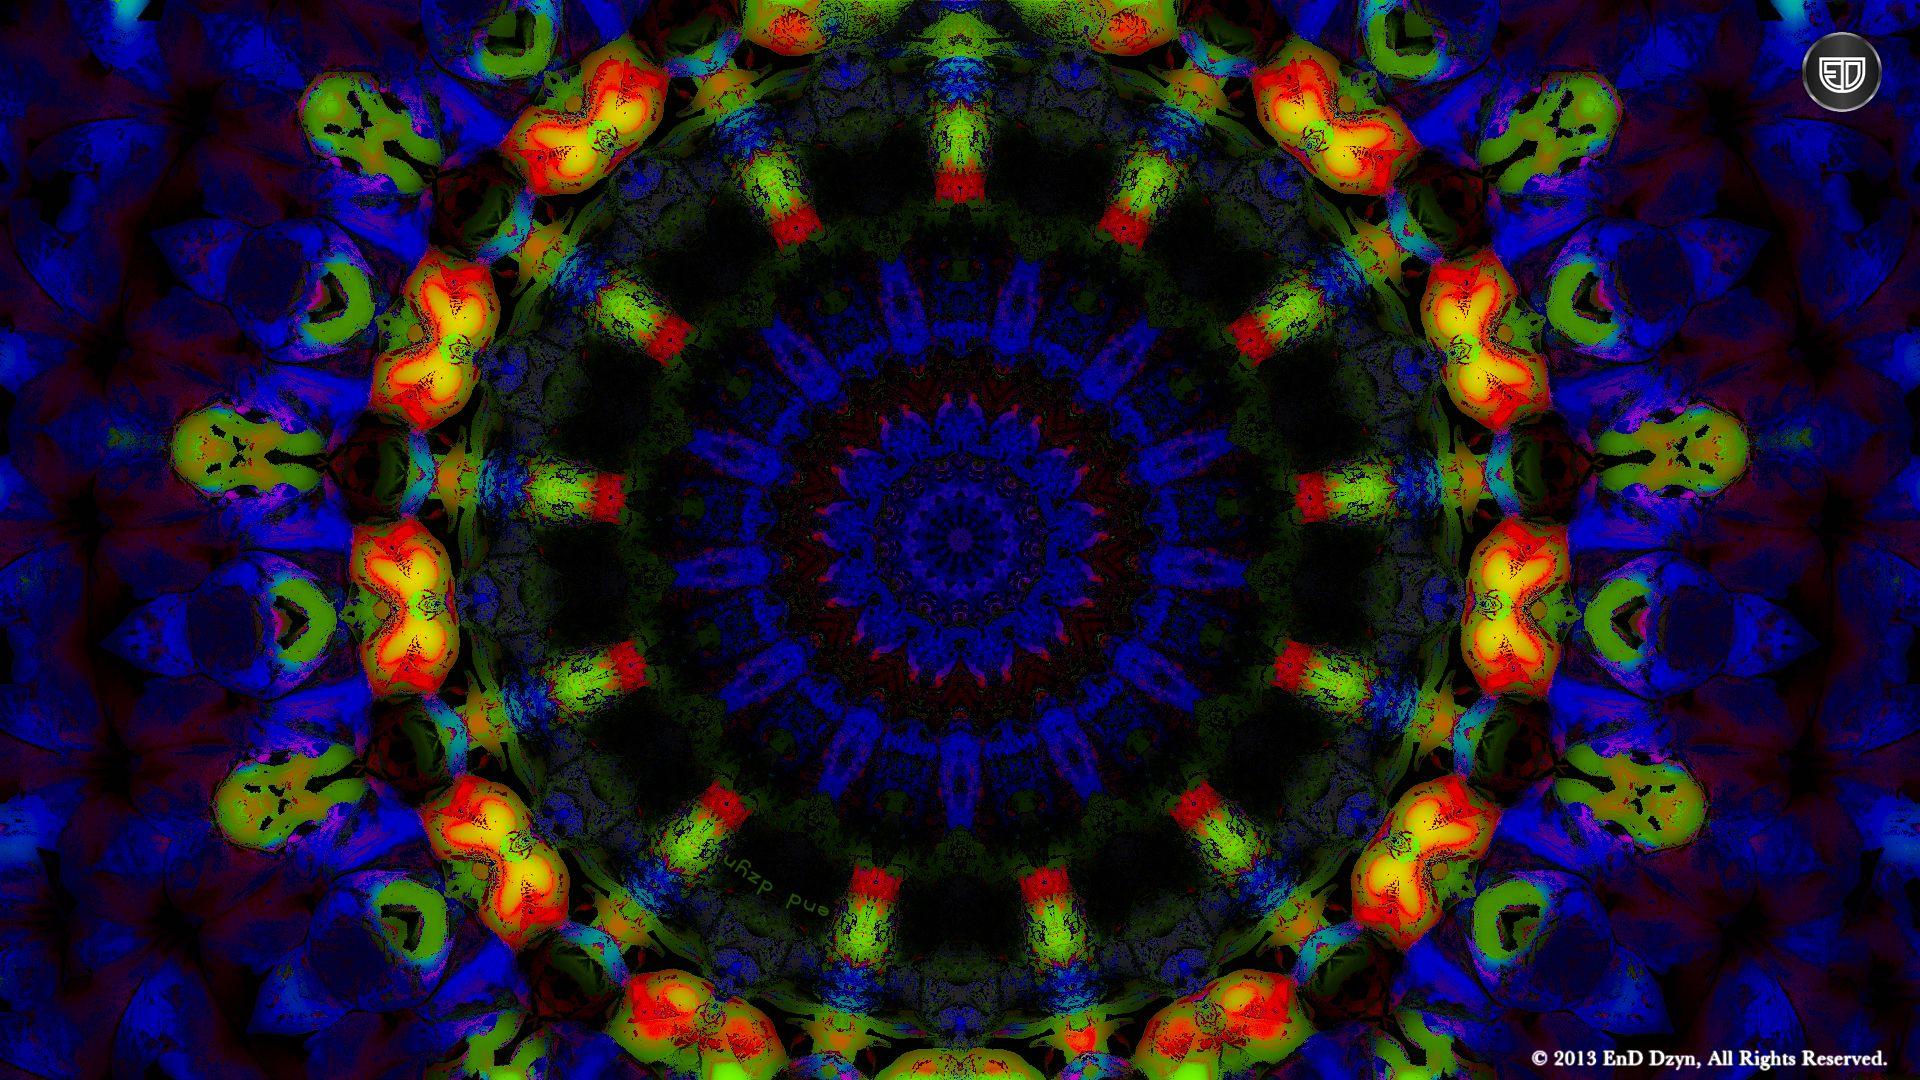 Trippy Psychedelic 3D HD Trippy Blue Psychedelic Desktop